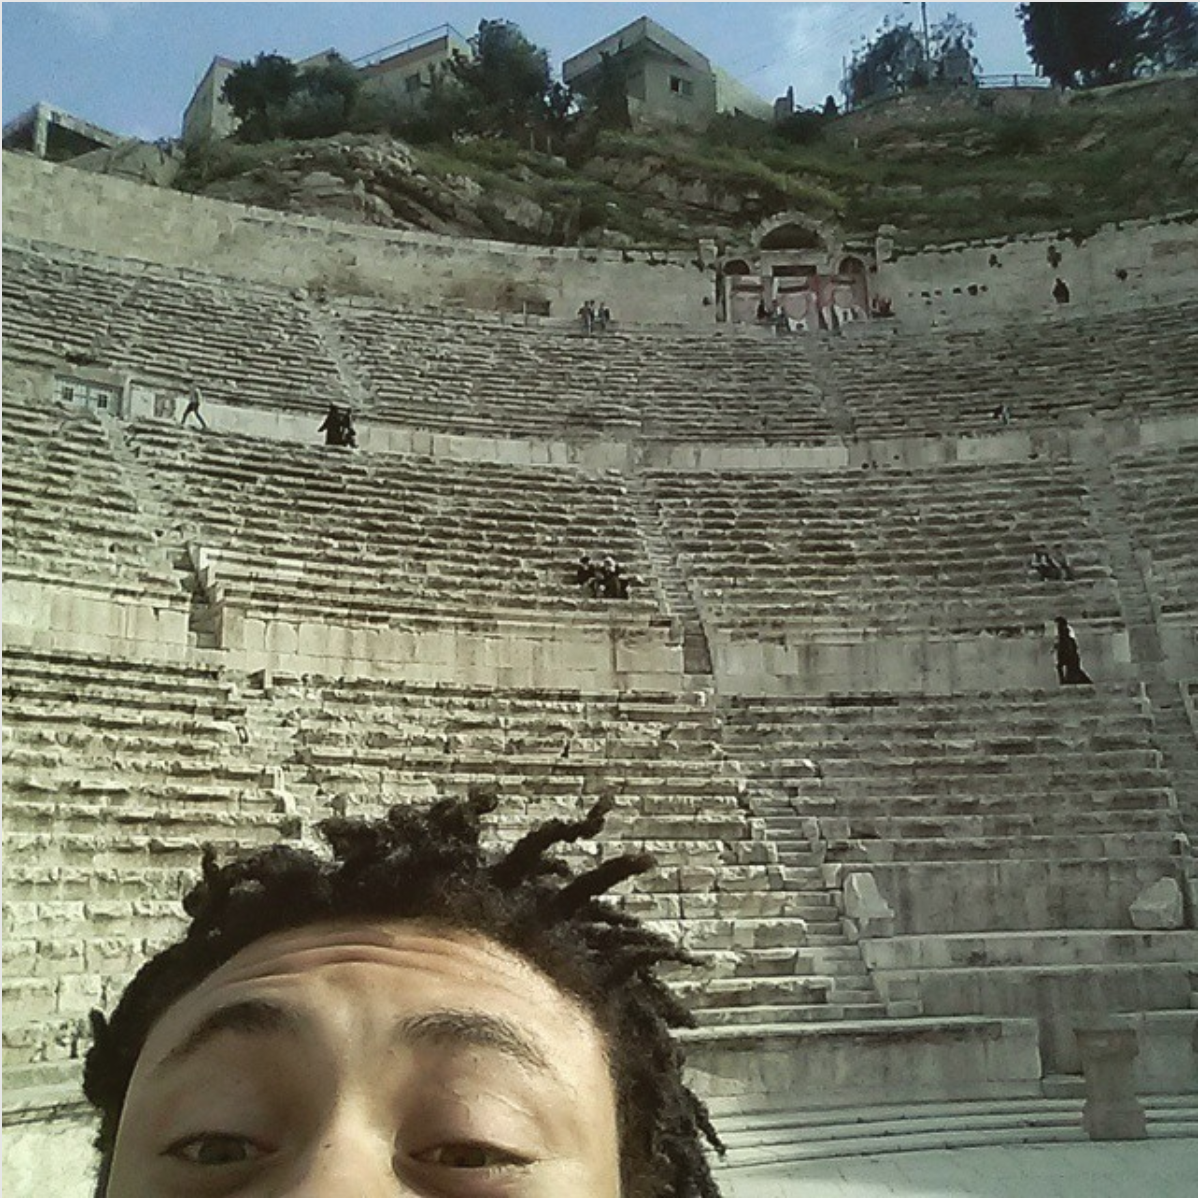 Roman amphitheater_Amman.png